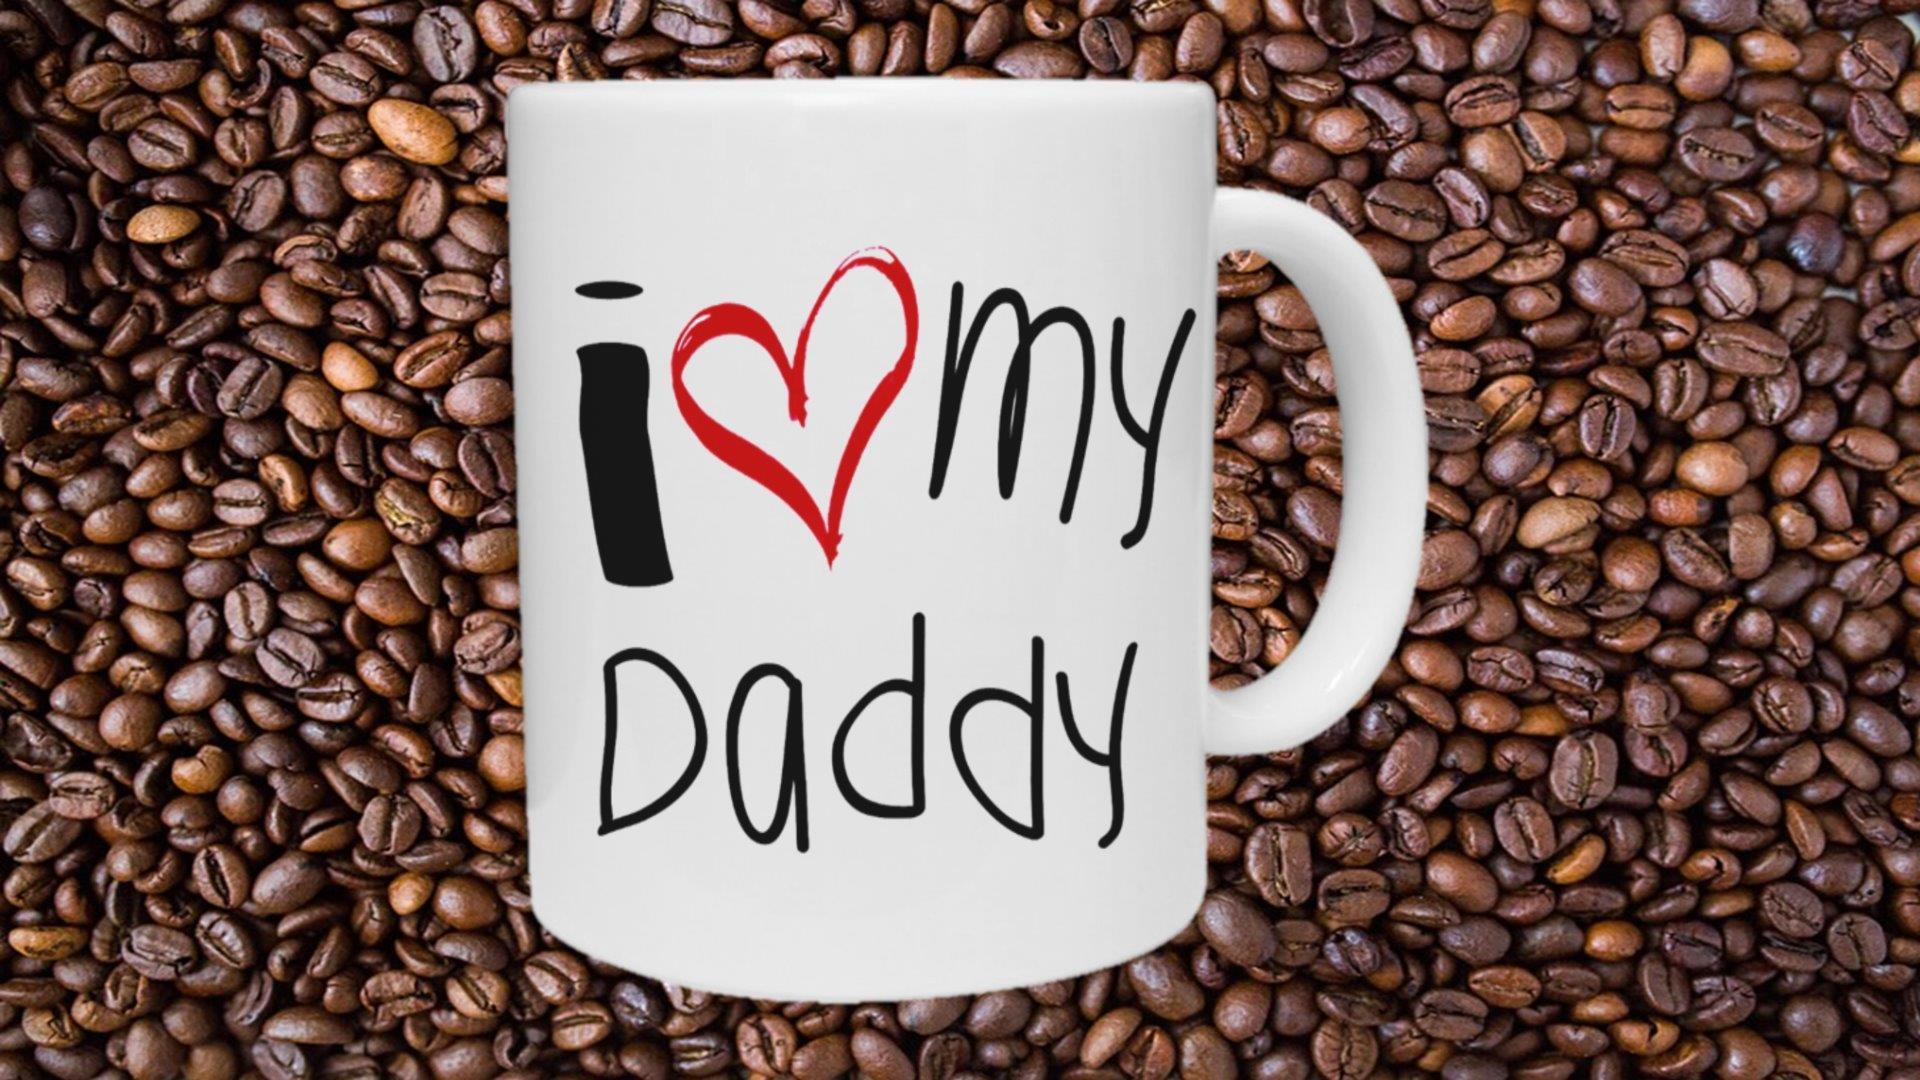 I-Love-My-Daddy-Novelty-Mug-Fathers-Day-Gift-Heart-Dad-Birthday-Gift